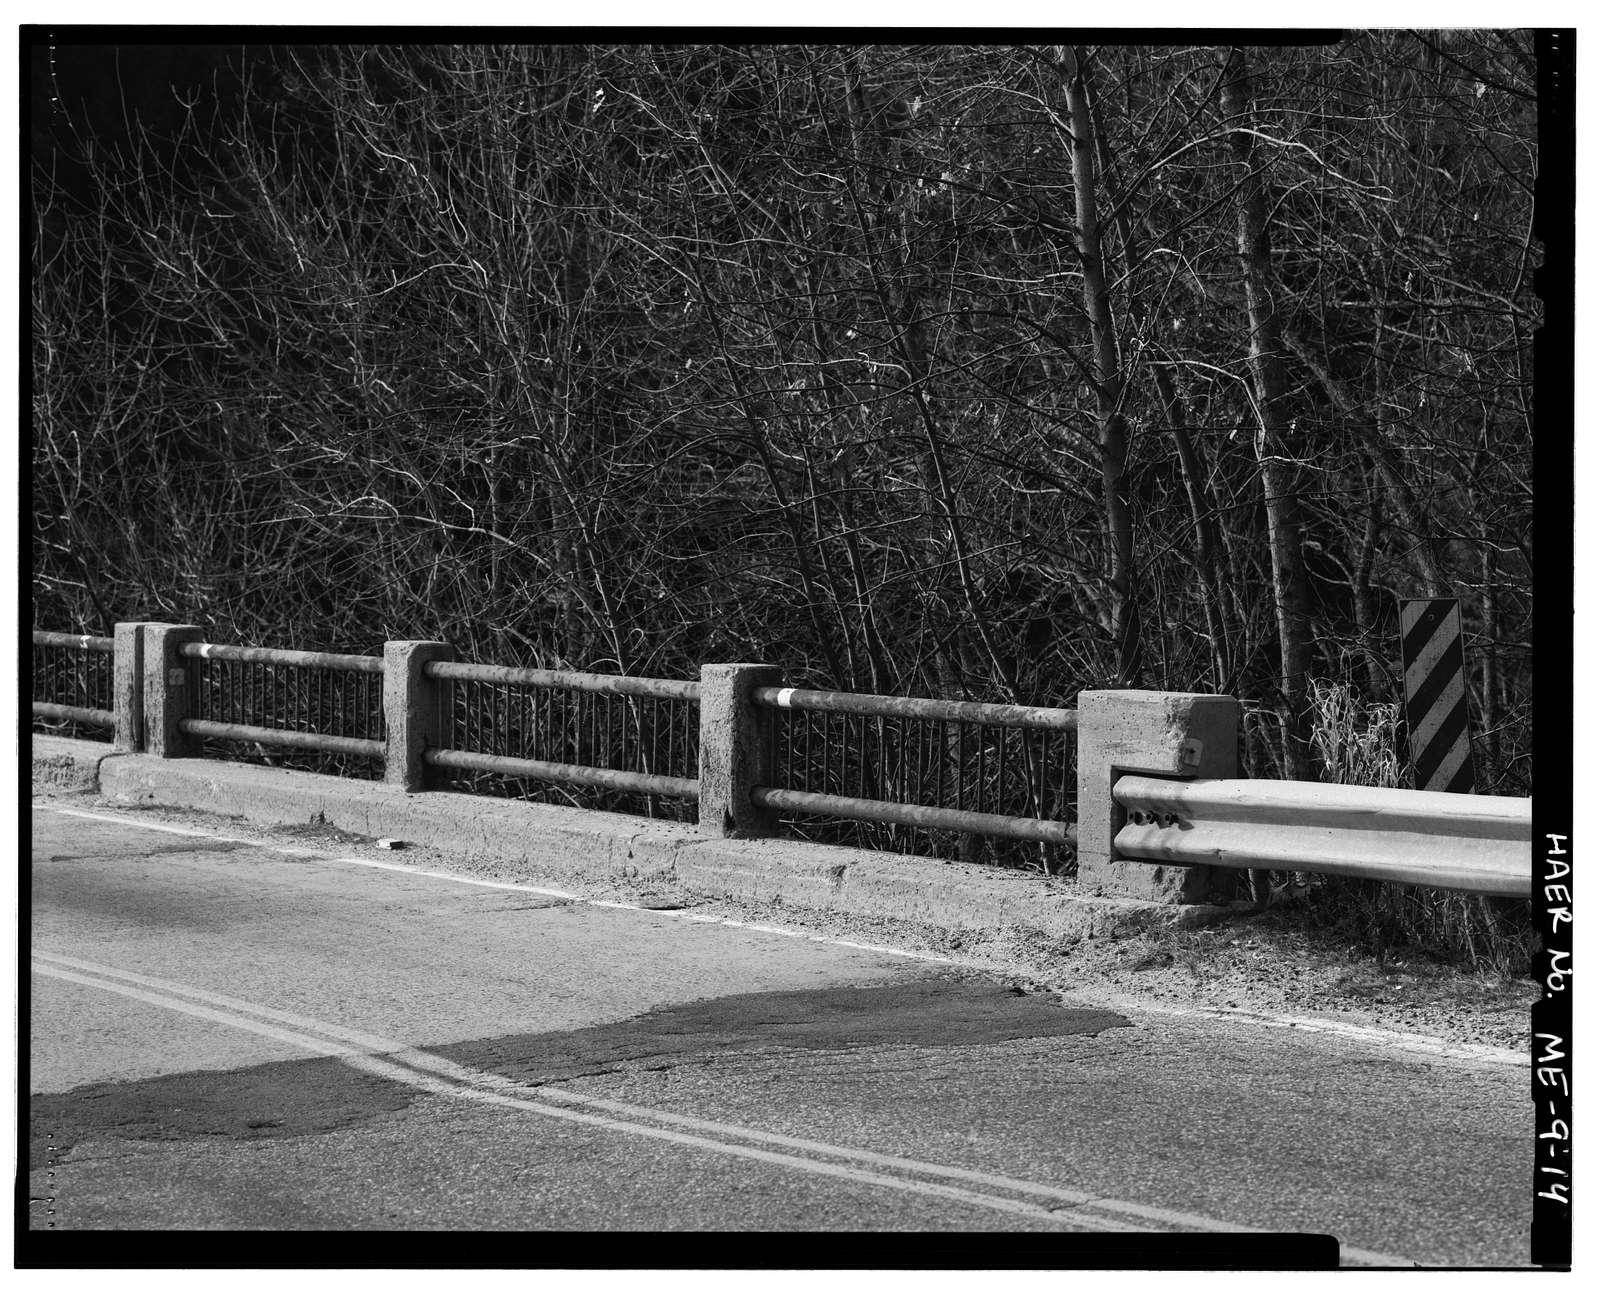 Presumpscot Falls Bridge, Spanning Presumptscot River at Allen Avenue extension, 0.75 mile west of U.S. Interstate 95, Falmouth, Cumberland County, ME